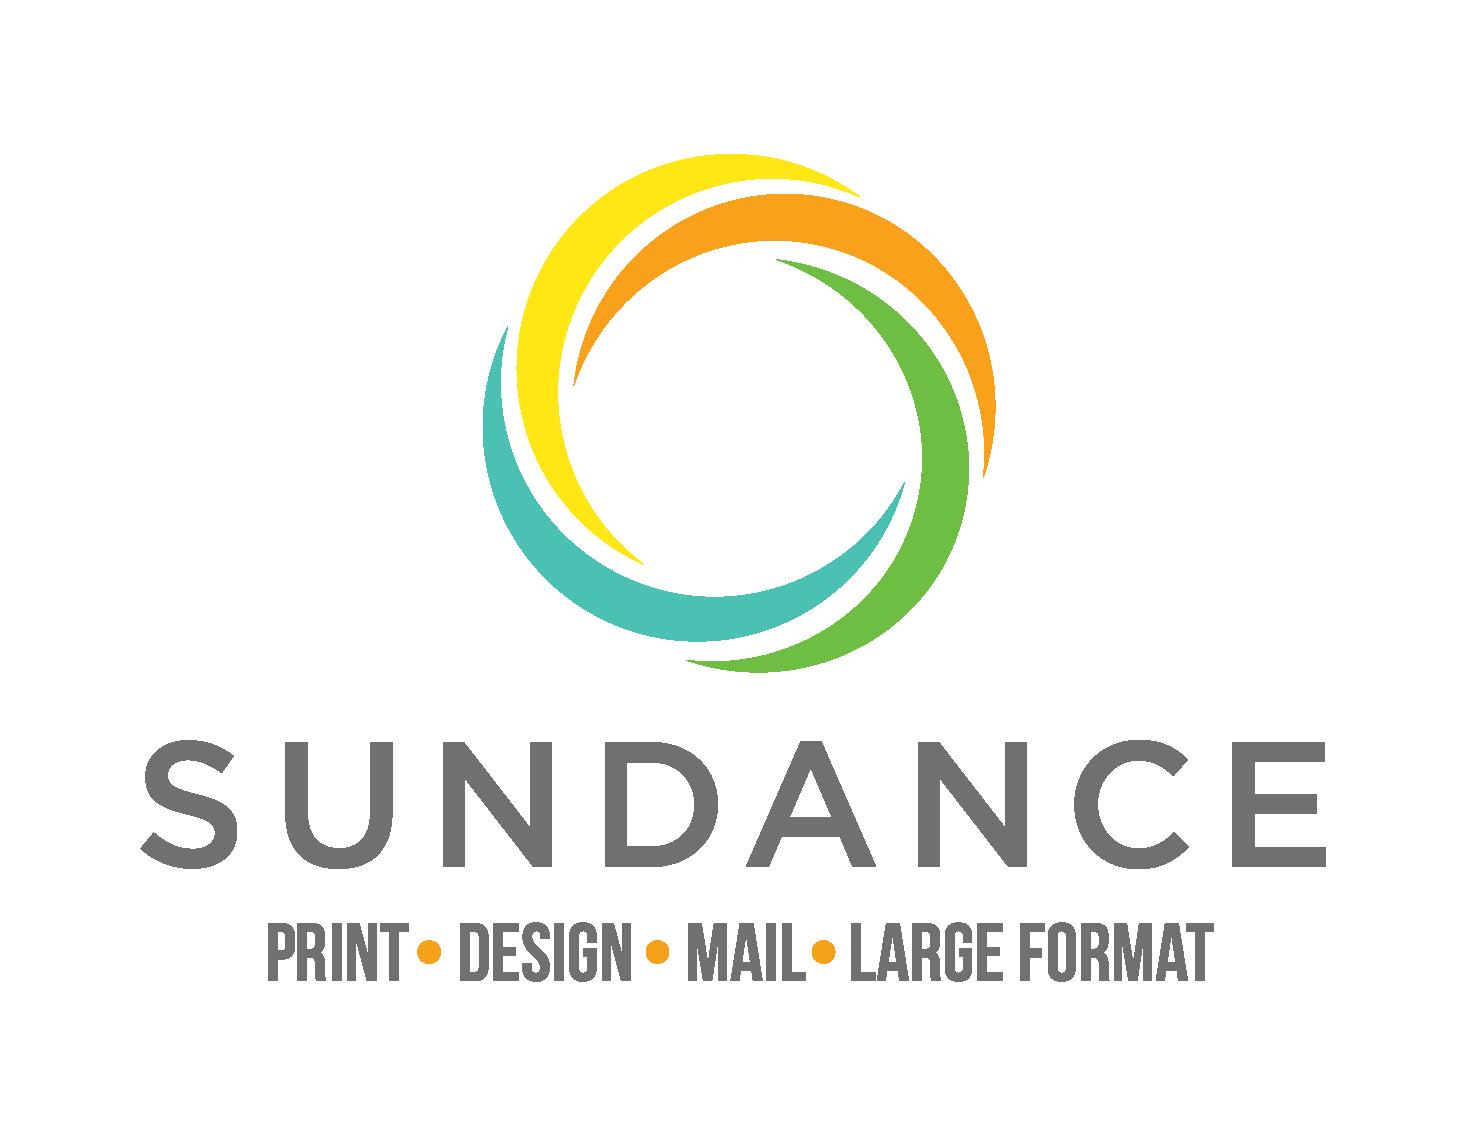 SunDance Brand Resources.